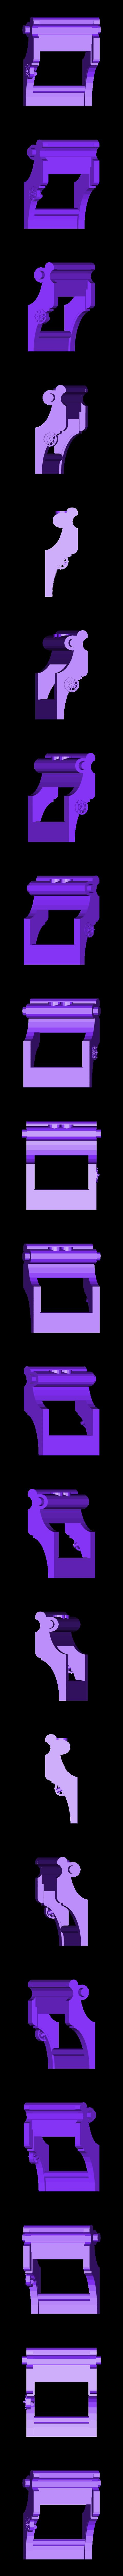 frame.stl Download free STL file Dwarf Organ Gun • 3D print design, mrhers2